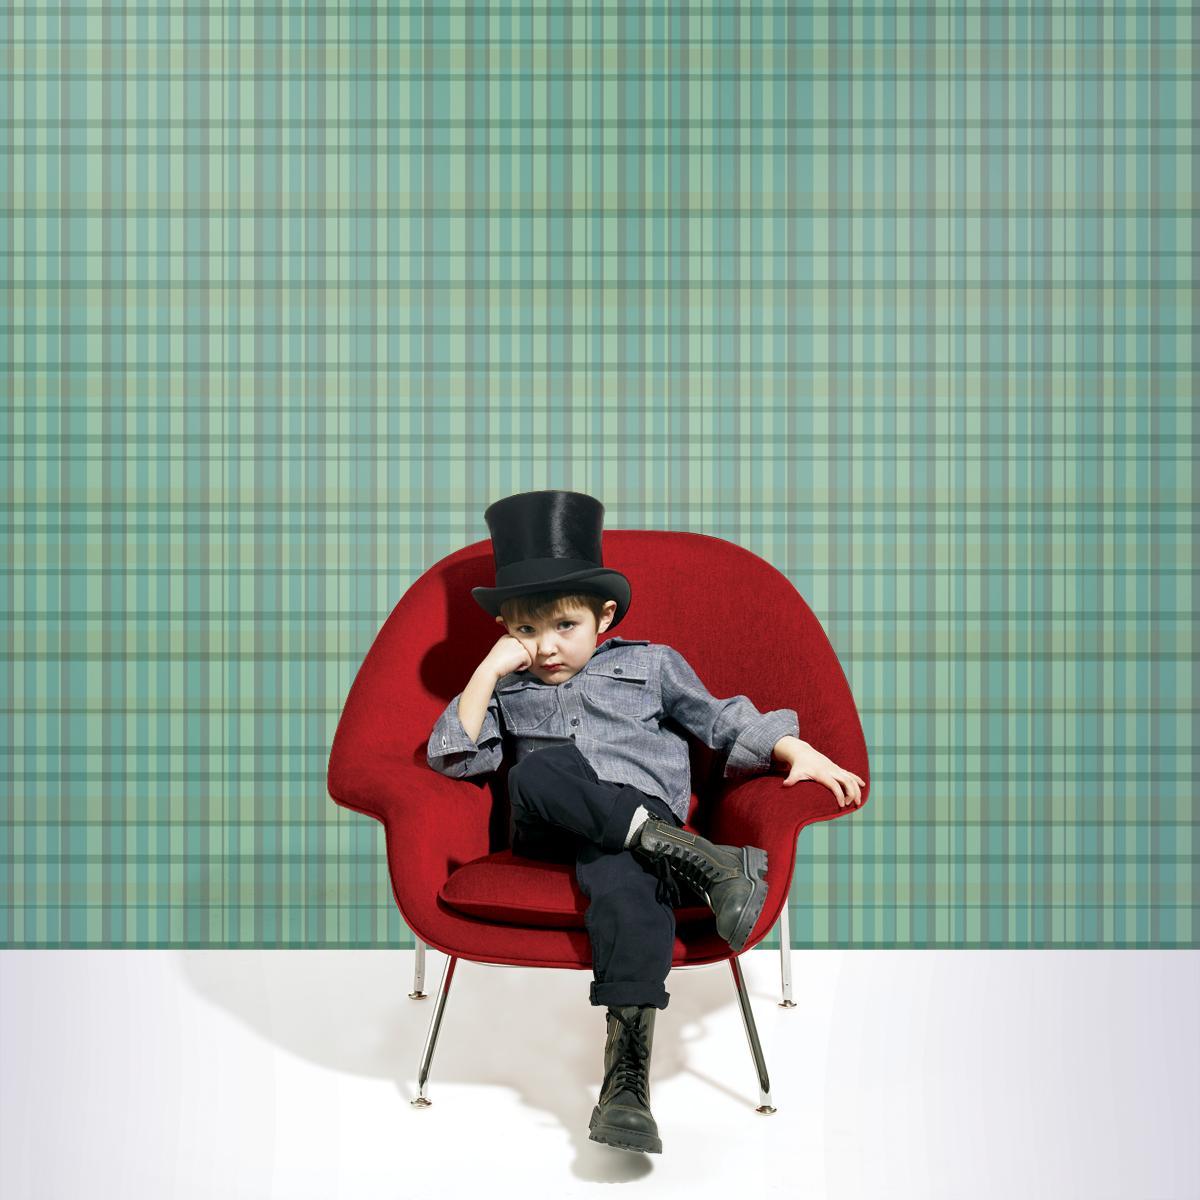 Plaid Green Removable Wallpaper Wall Decals Art Decor Removable Wallpaper Wall Wallpaper Peel And Stick Wallpaper